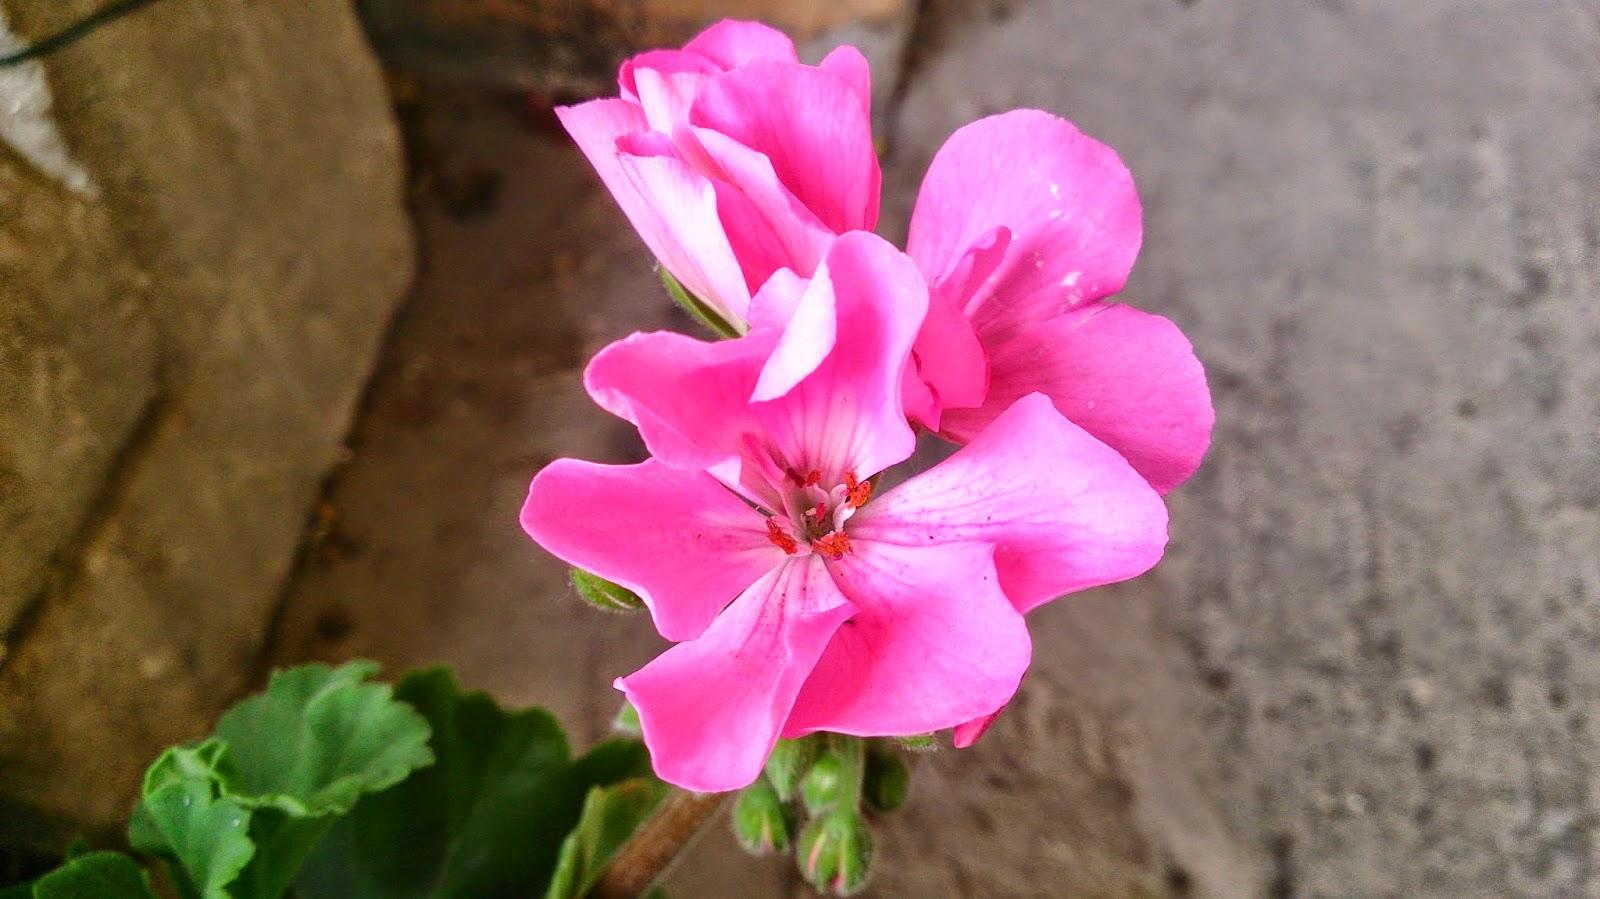 Verbena Flower Meaning images